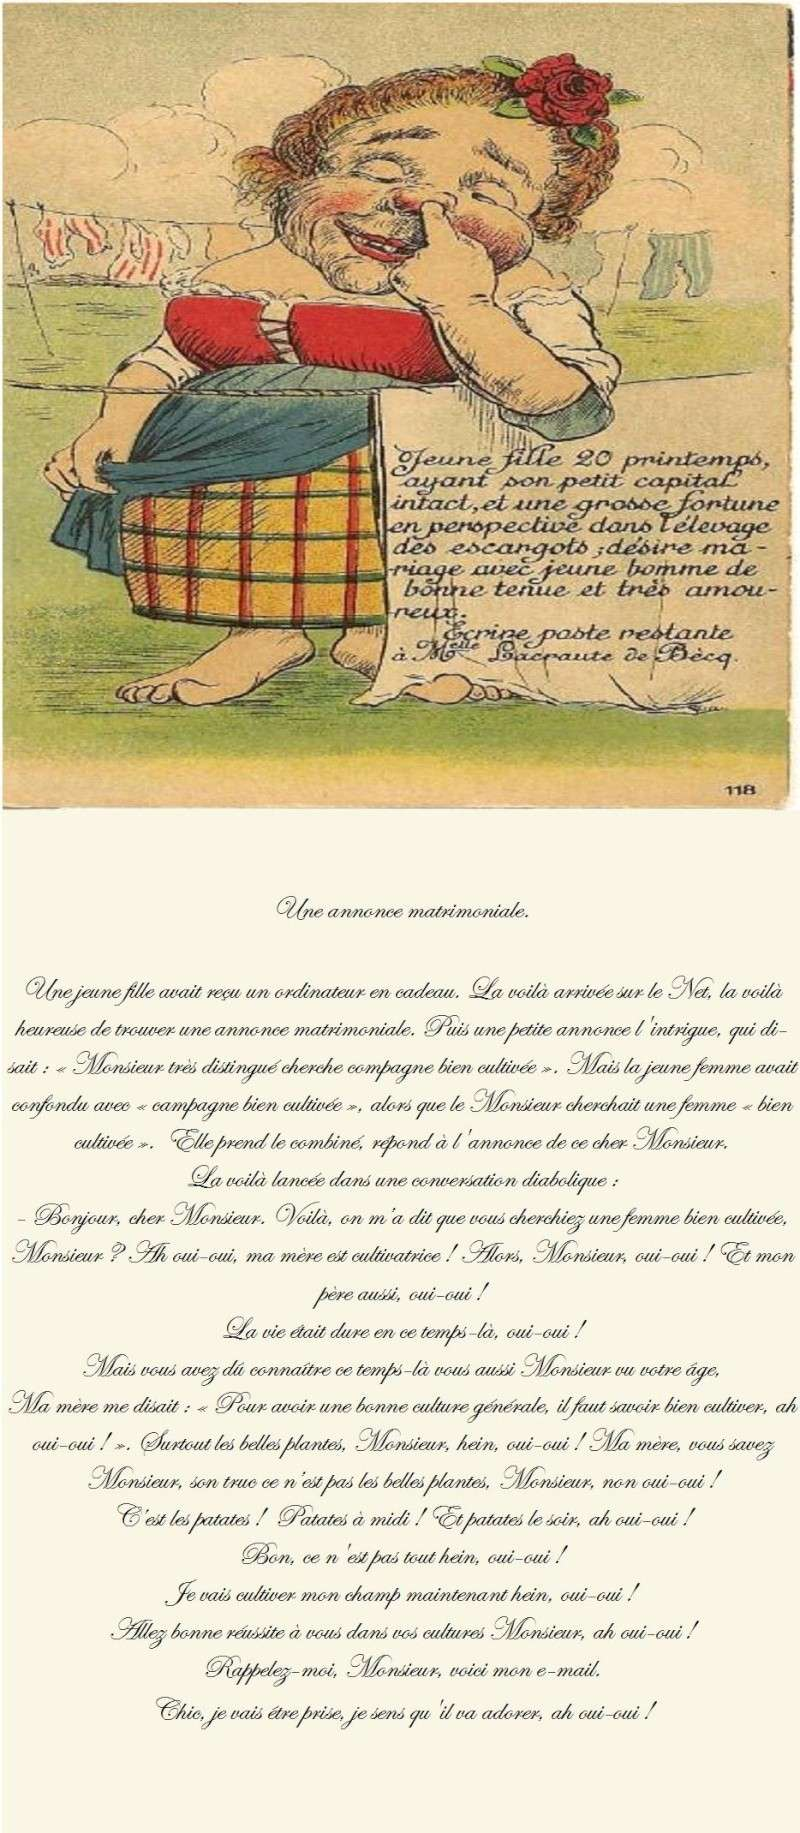 annonce matrimoniale Levallois-Perret